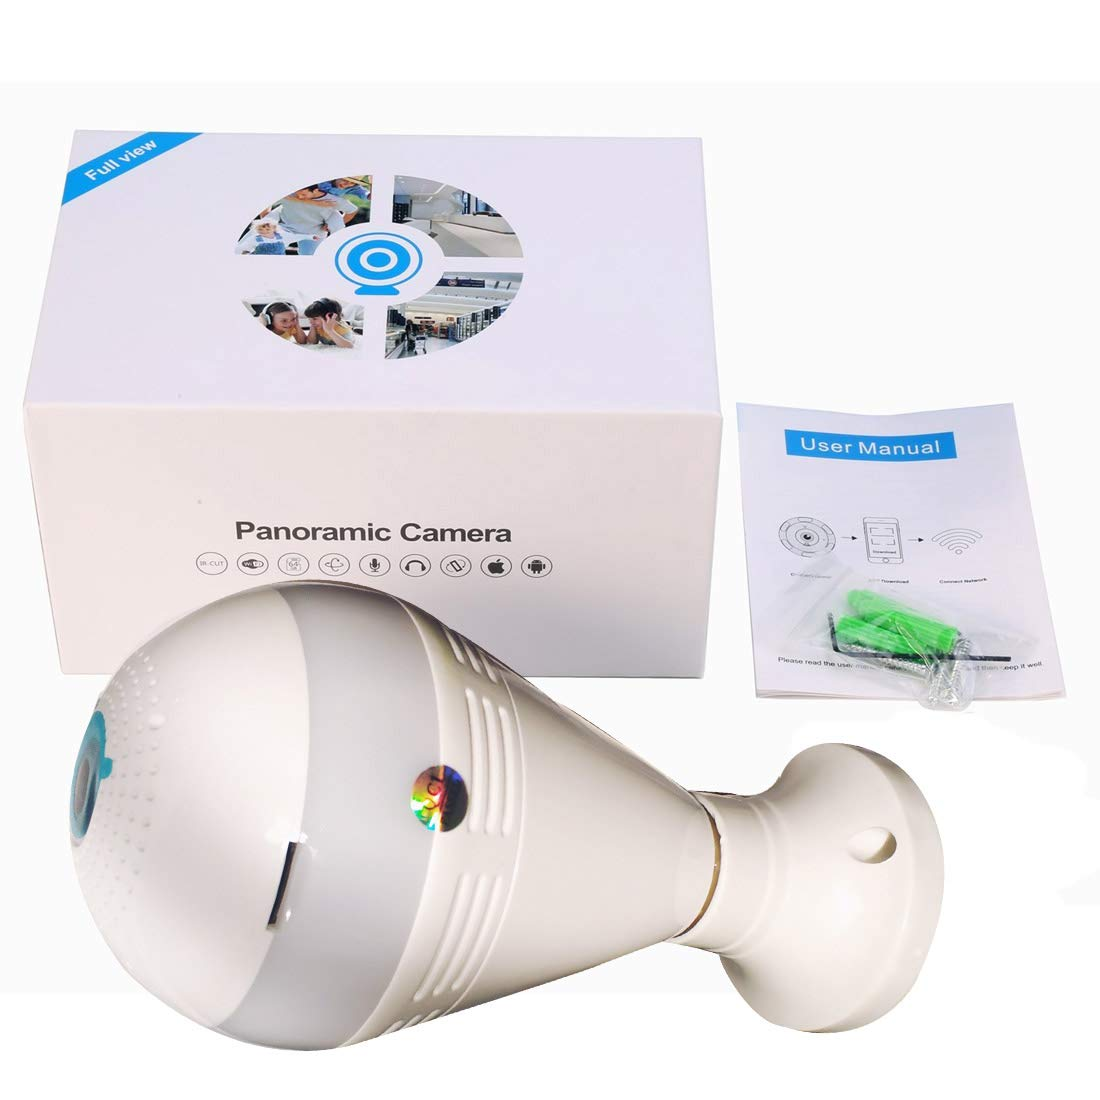 Wireless Hidden Light Bulb Camera 360 Degree Panoramic Led WiFi Fish Eye Security IP Micro Cam Light Night Vision Motion Detection Baby Pet Surveillance mliyam 860983